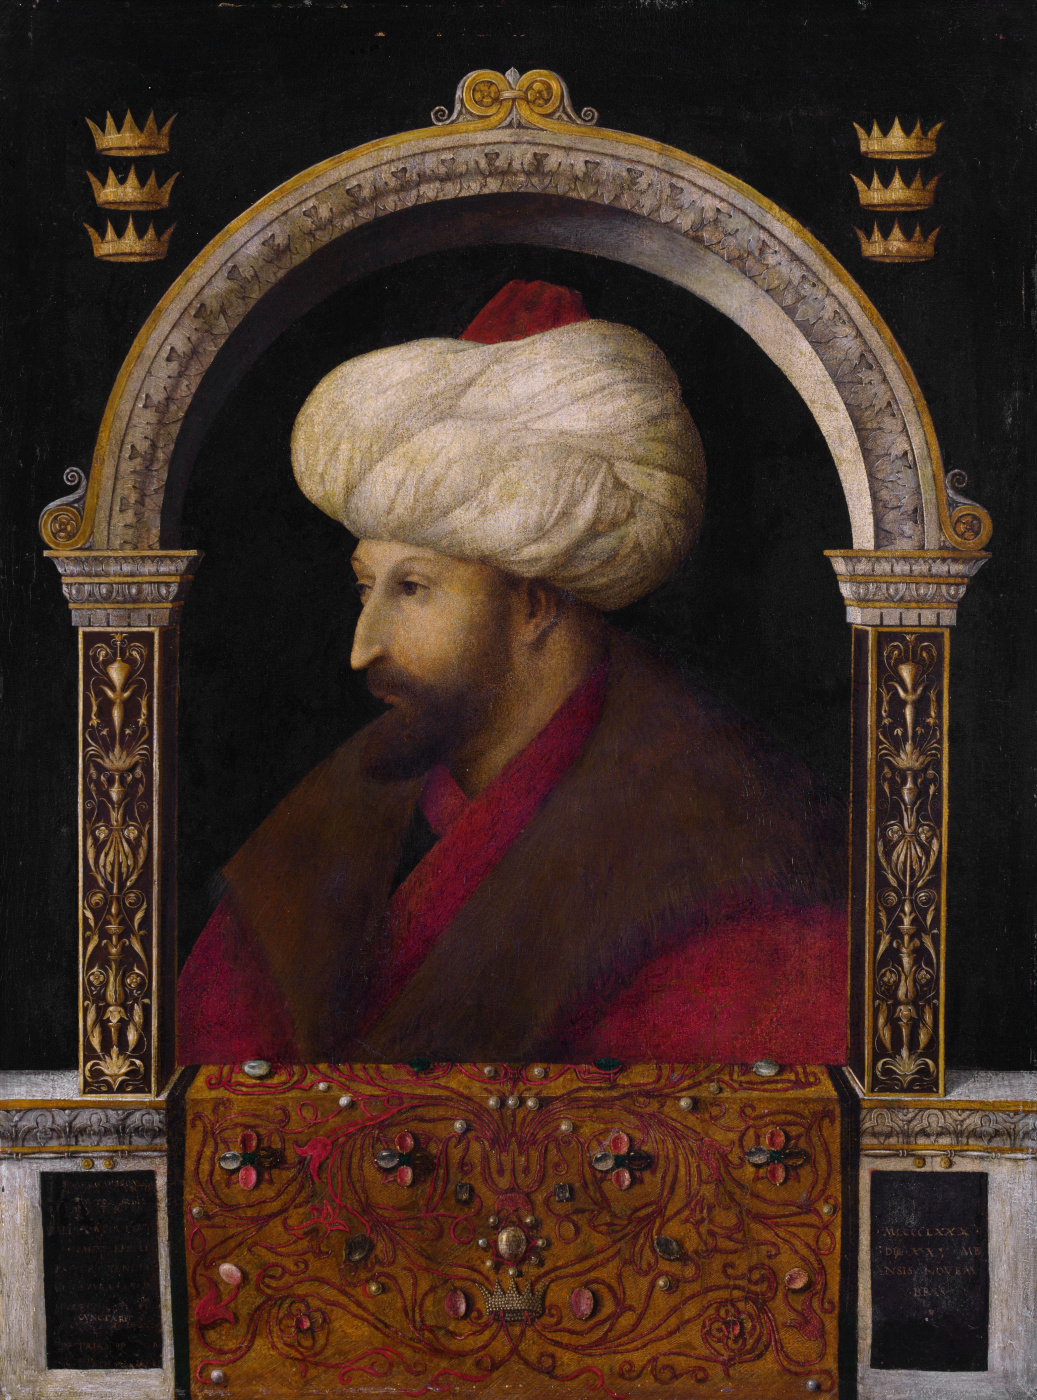 Gentile Bellini. Portrait of Sultan Mehmed II the Conqueror